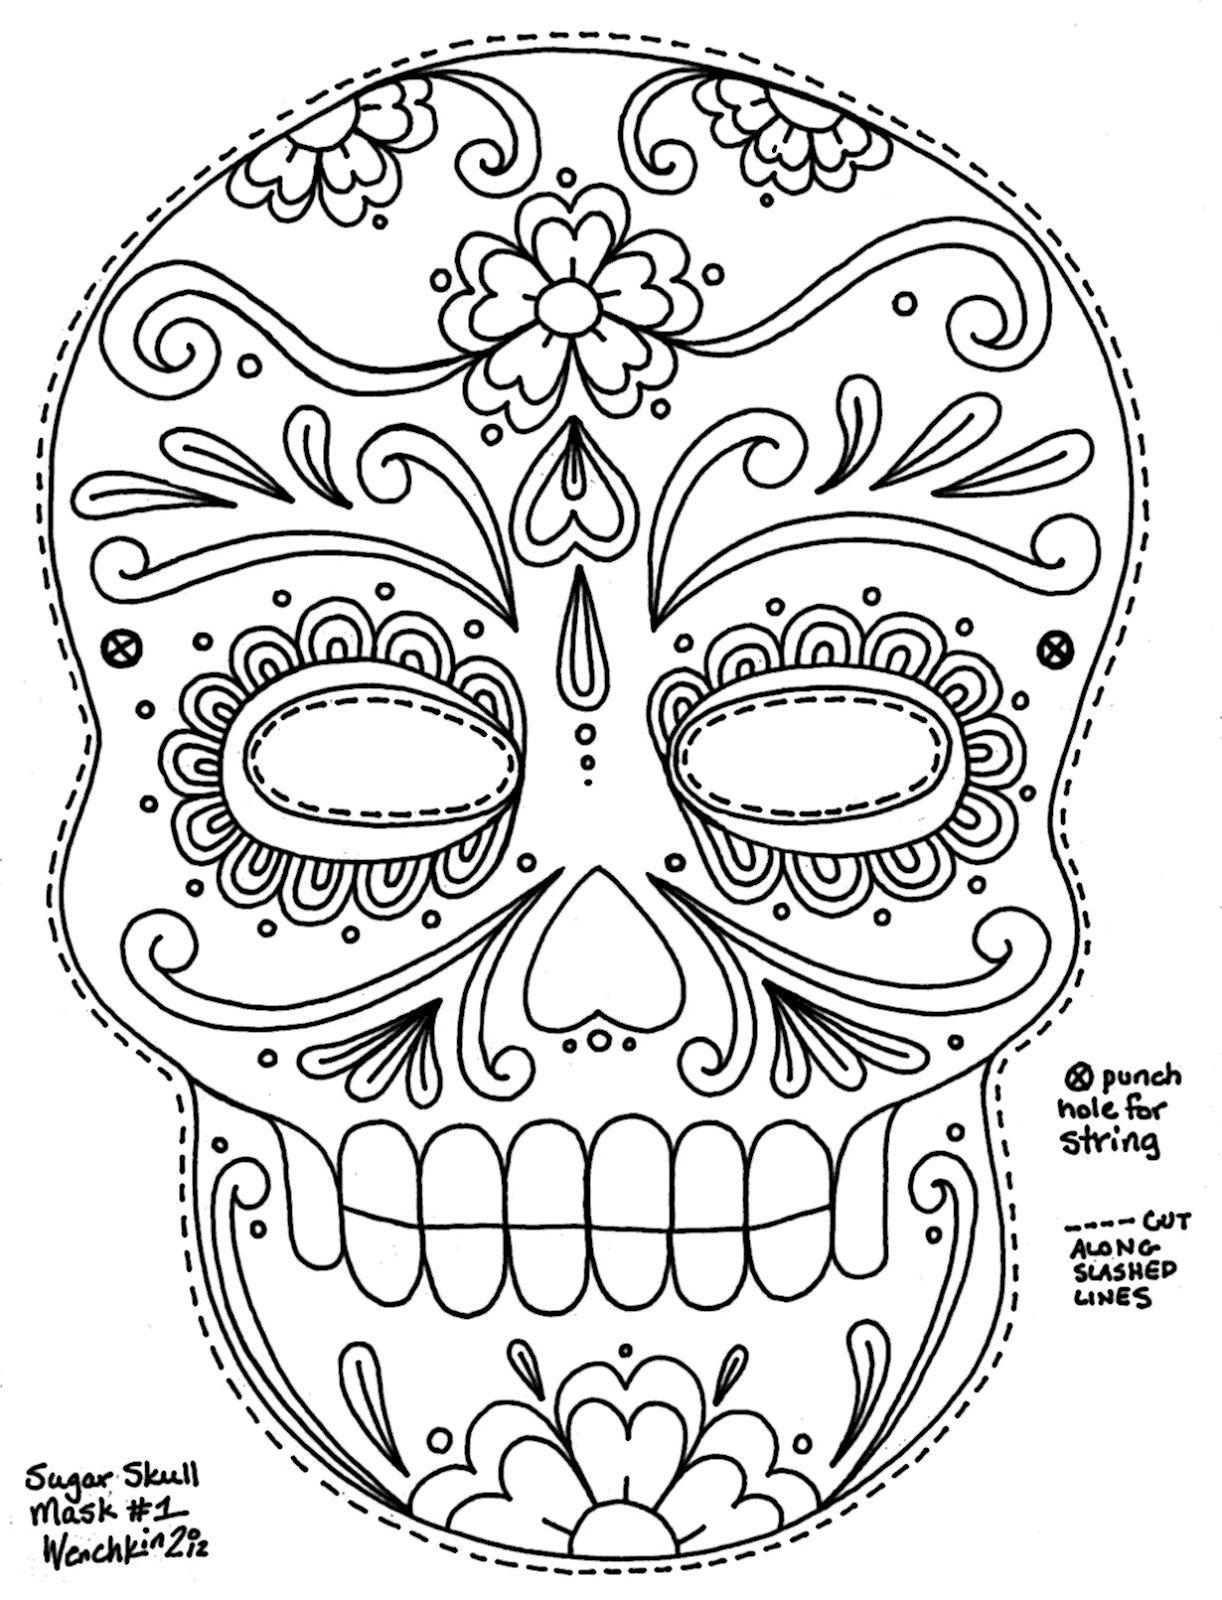 Free Printable Character Face Masks | Pinterest | Pumpkin ideas ...